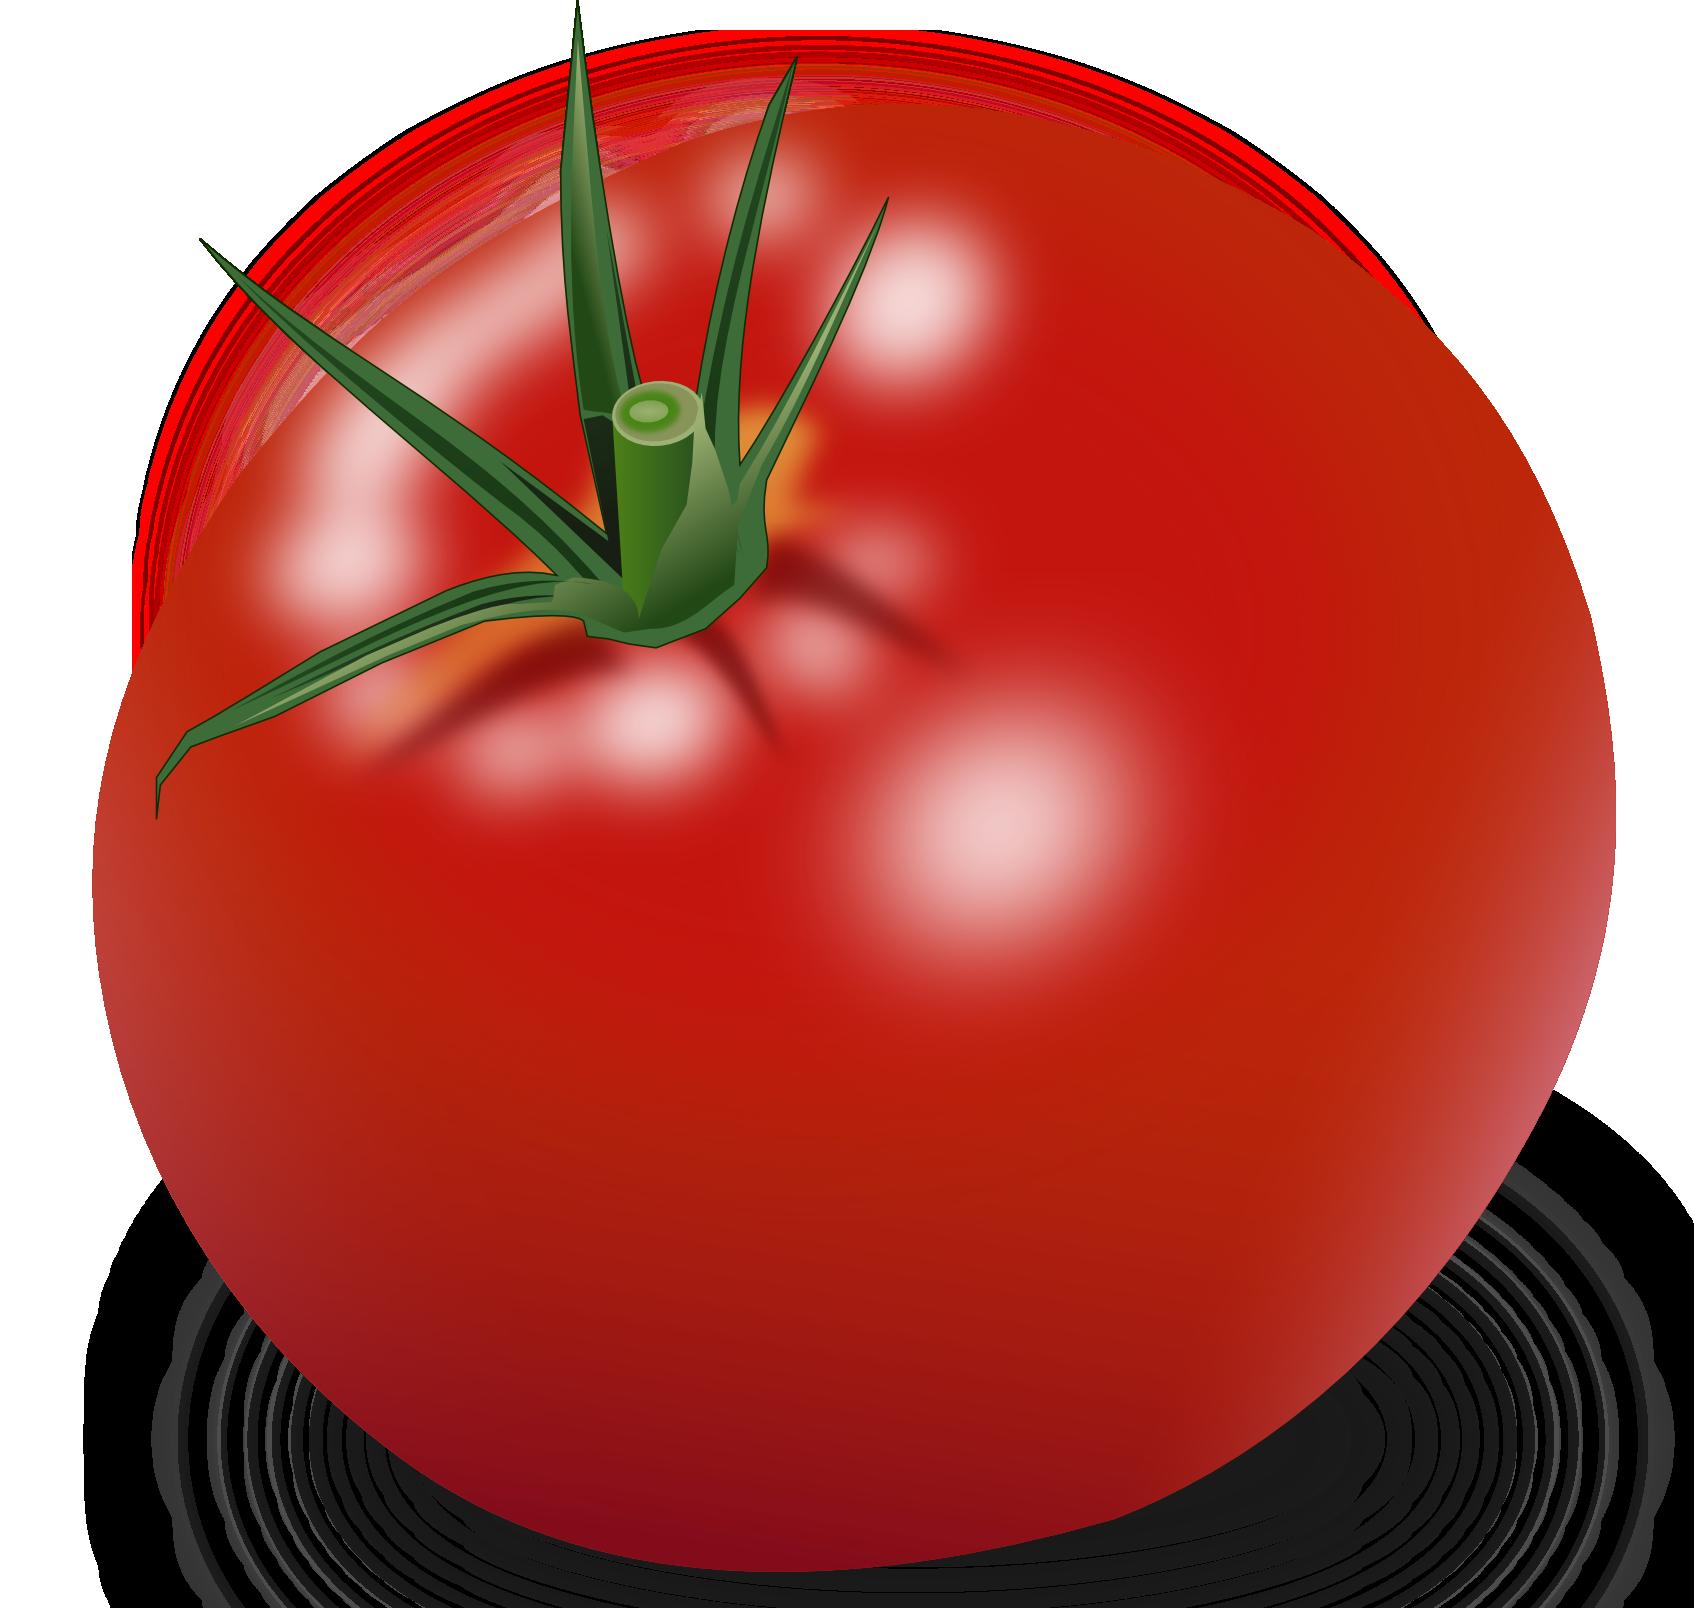 Tomato Plant Clip Art Free Vector Clipart Best Clipart Best Clip Art Garden Clipart Vegetable Drawing